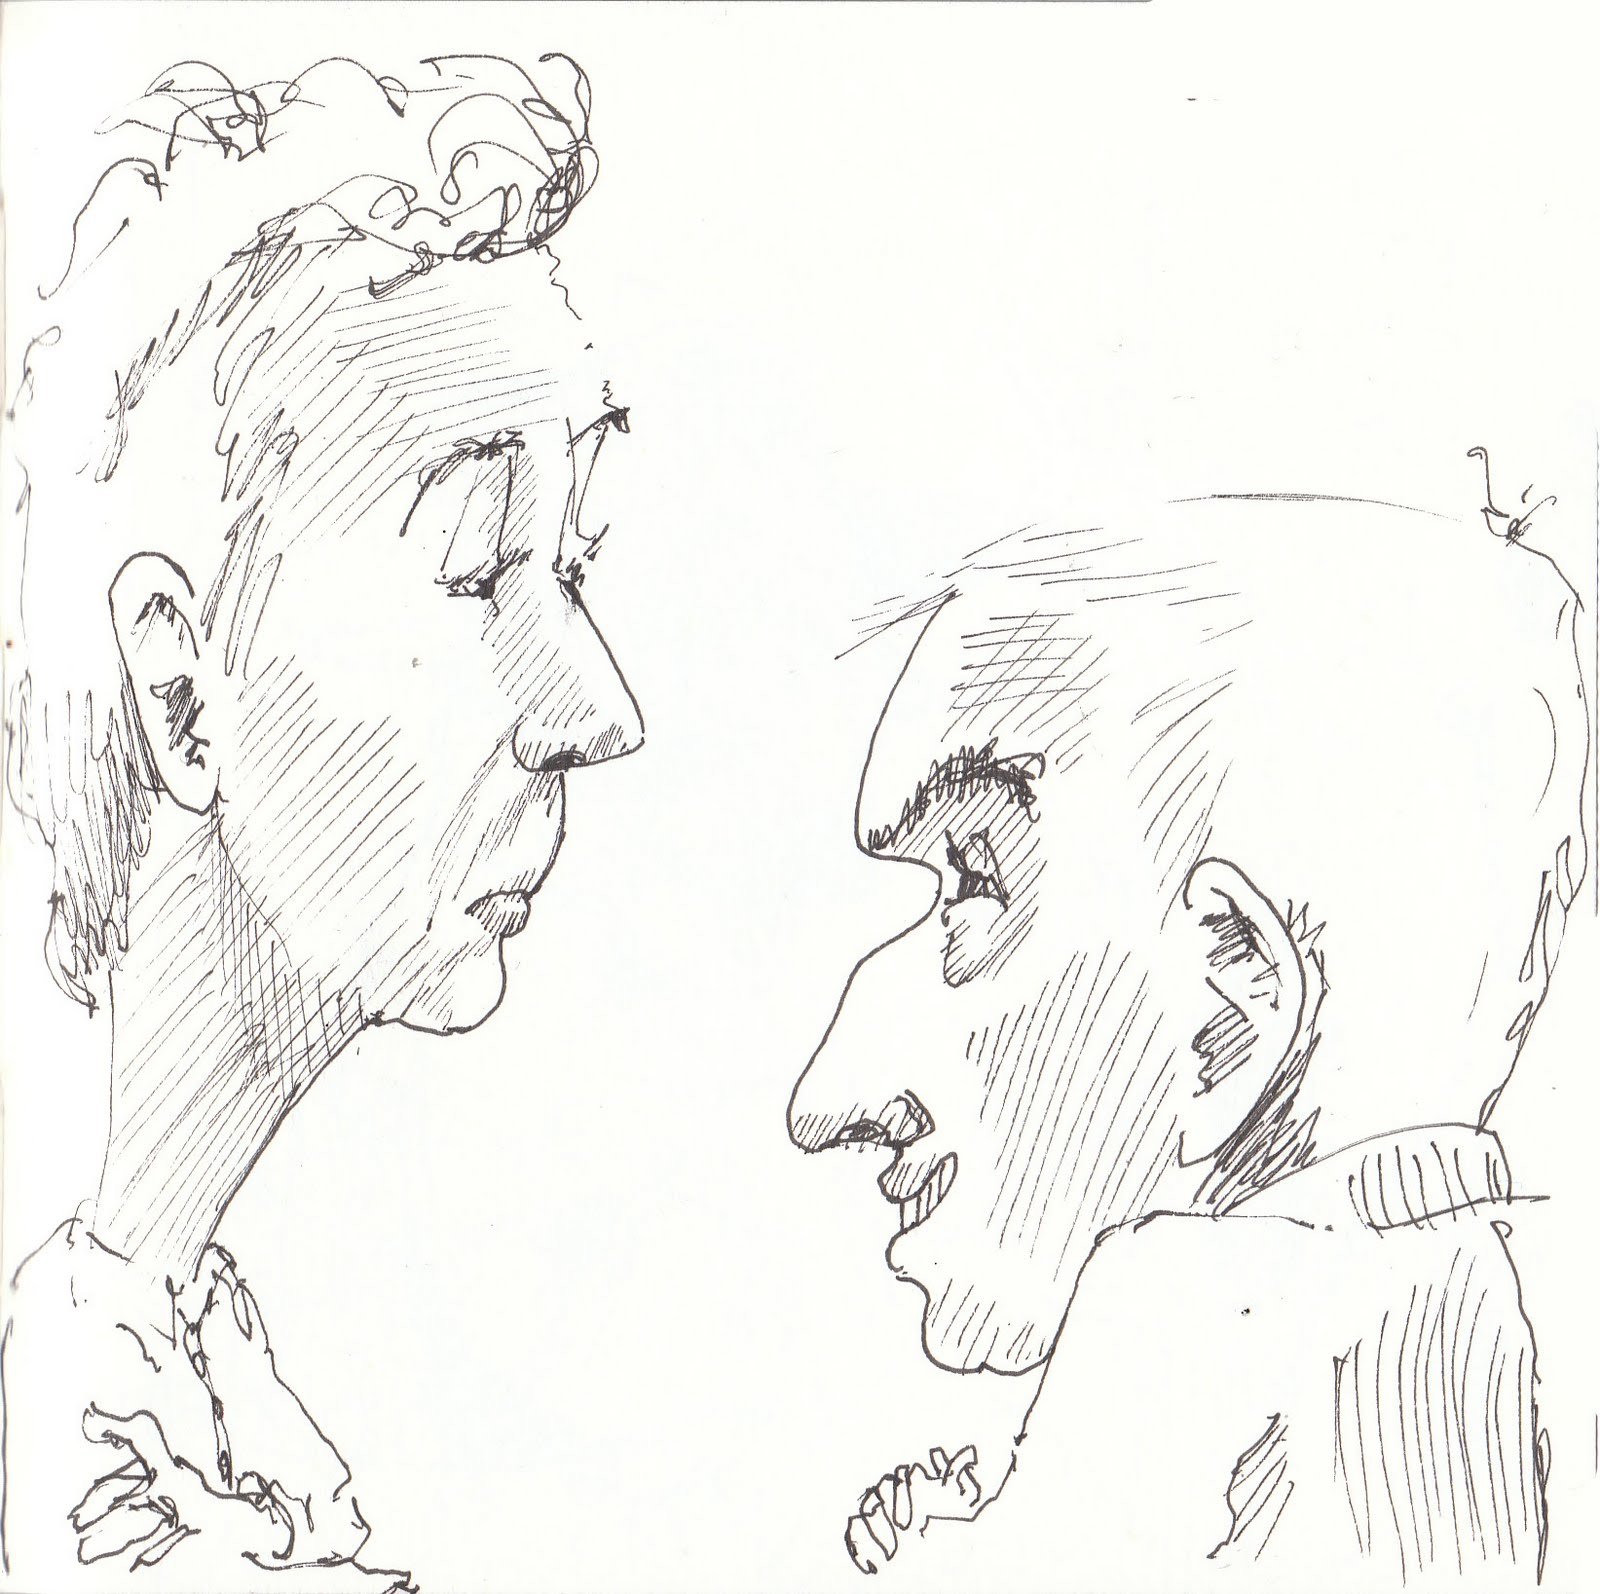 Philippa Randles Illustration: some fun quick caricatures...